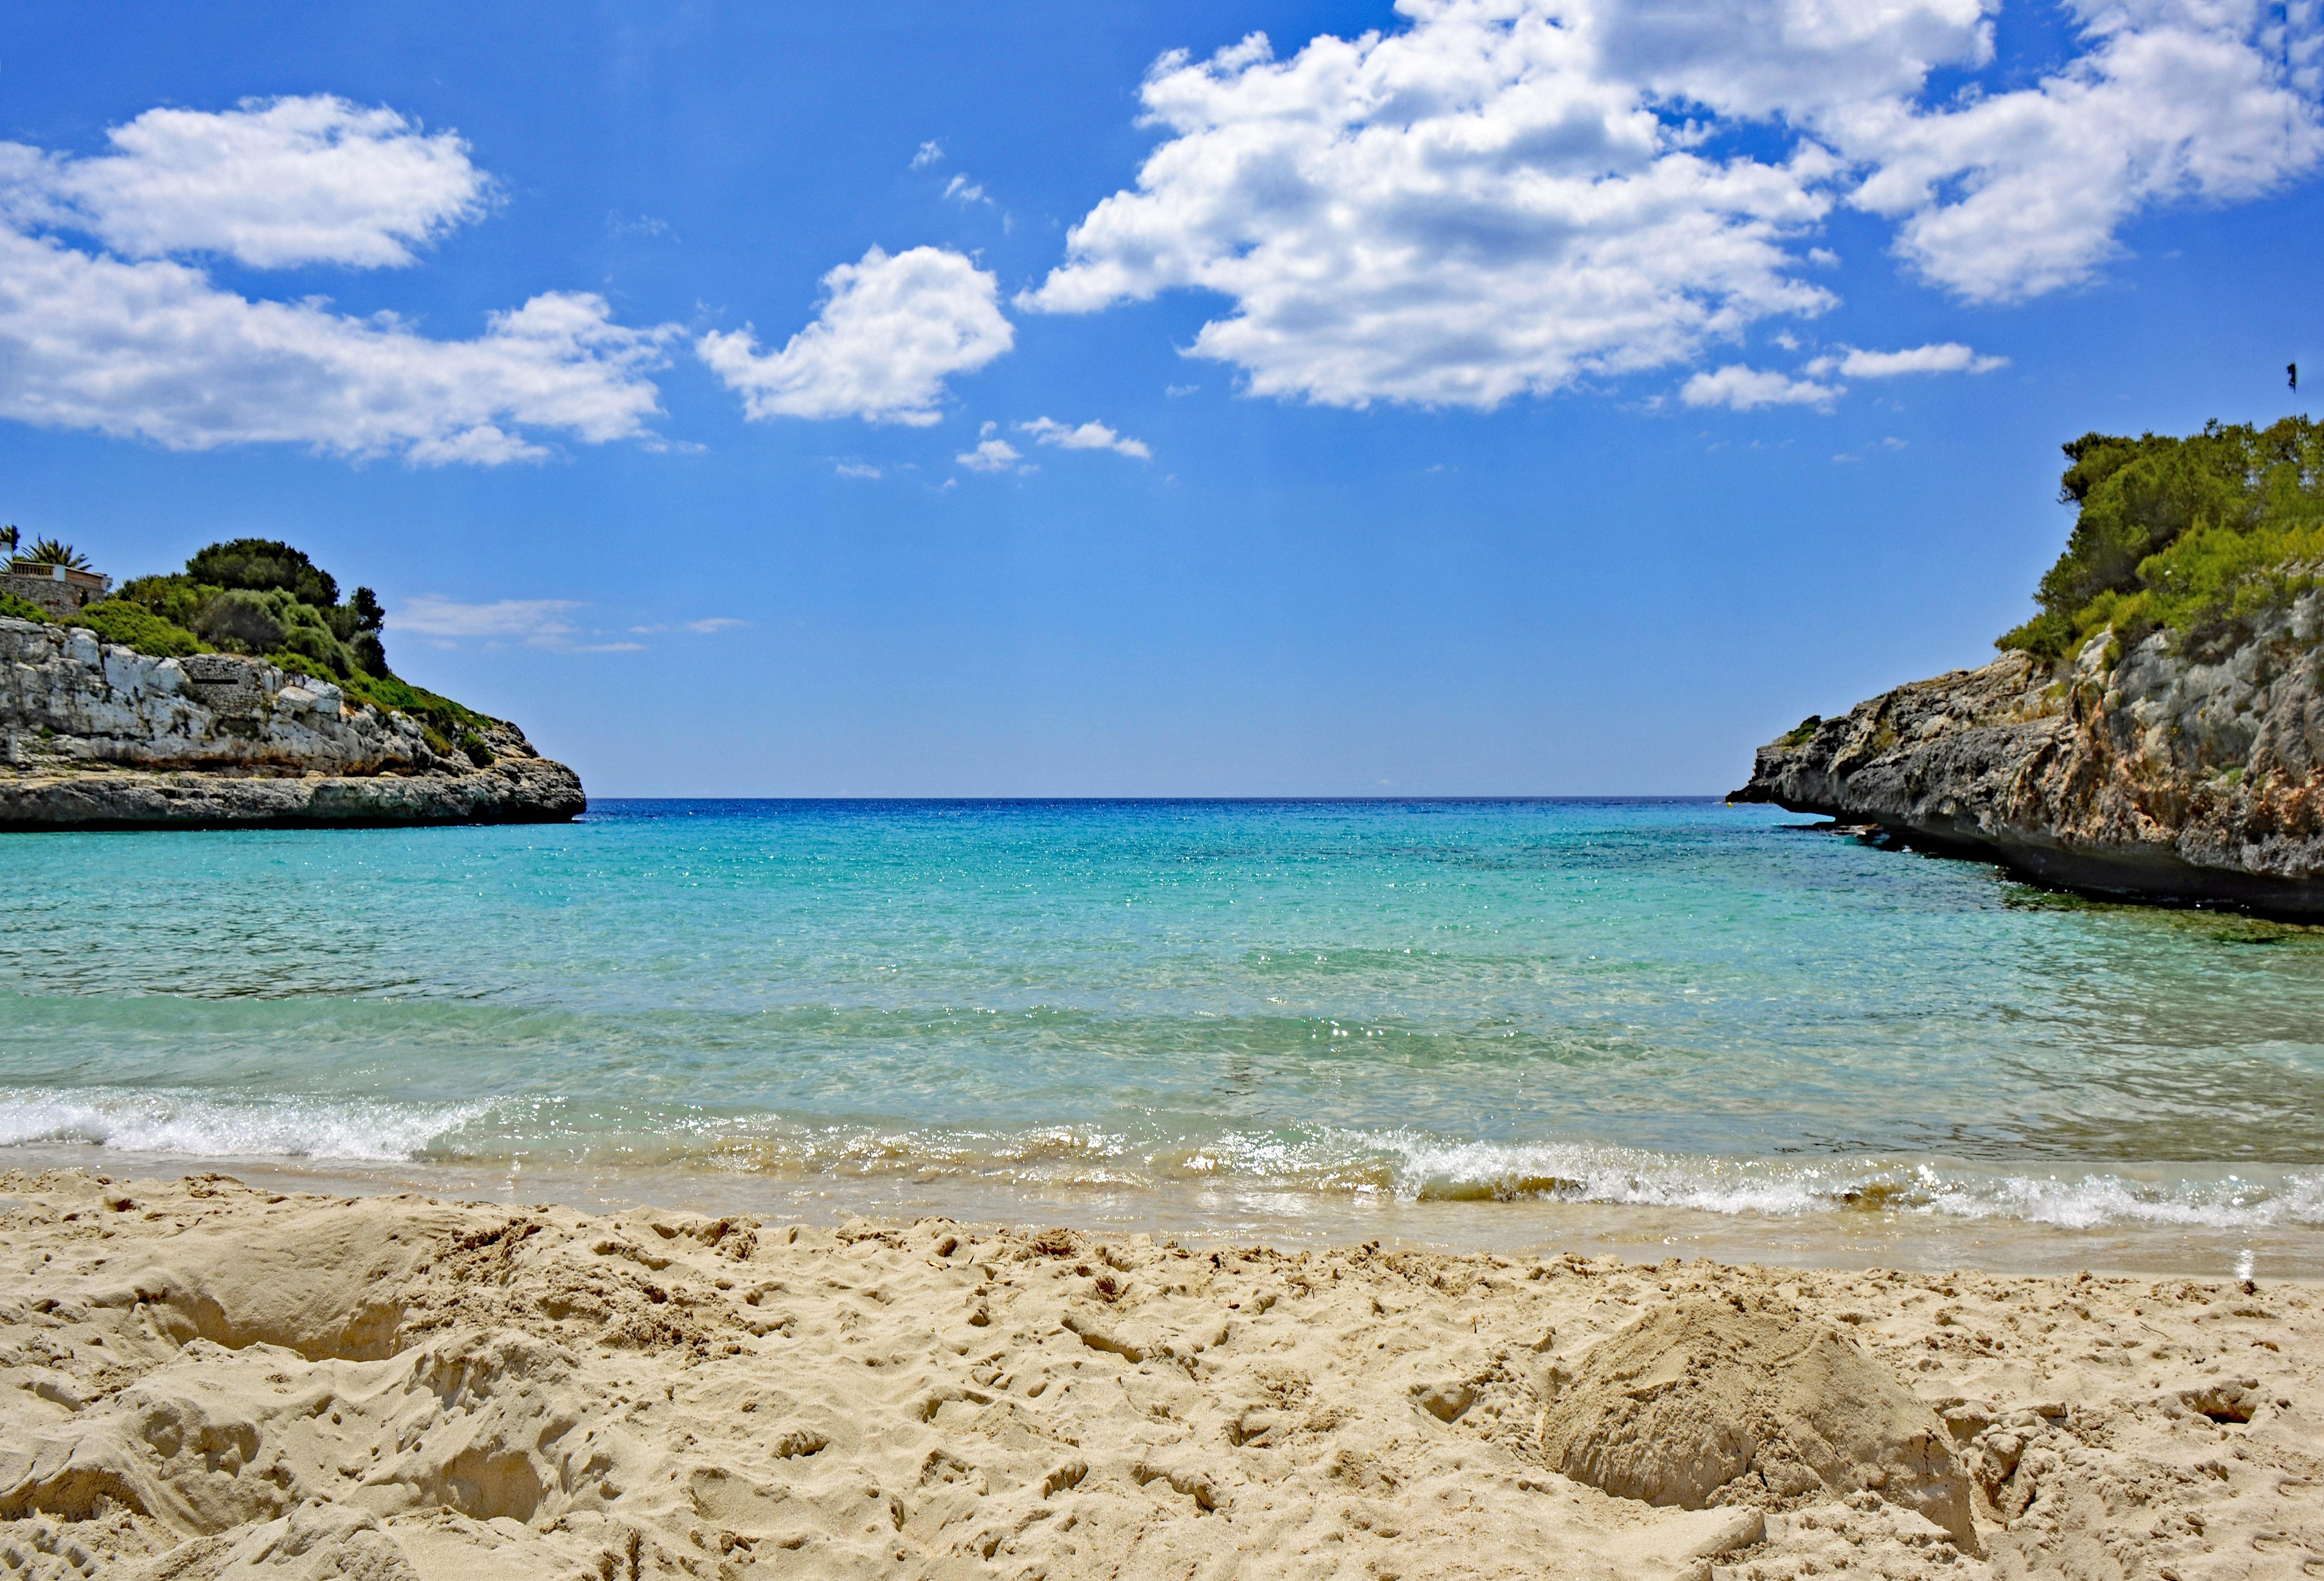 надо срочно фото испанских морских берегов любви родине